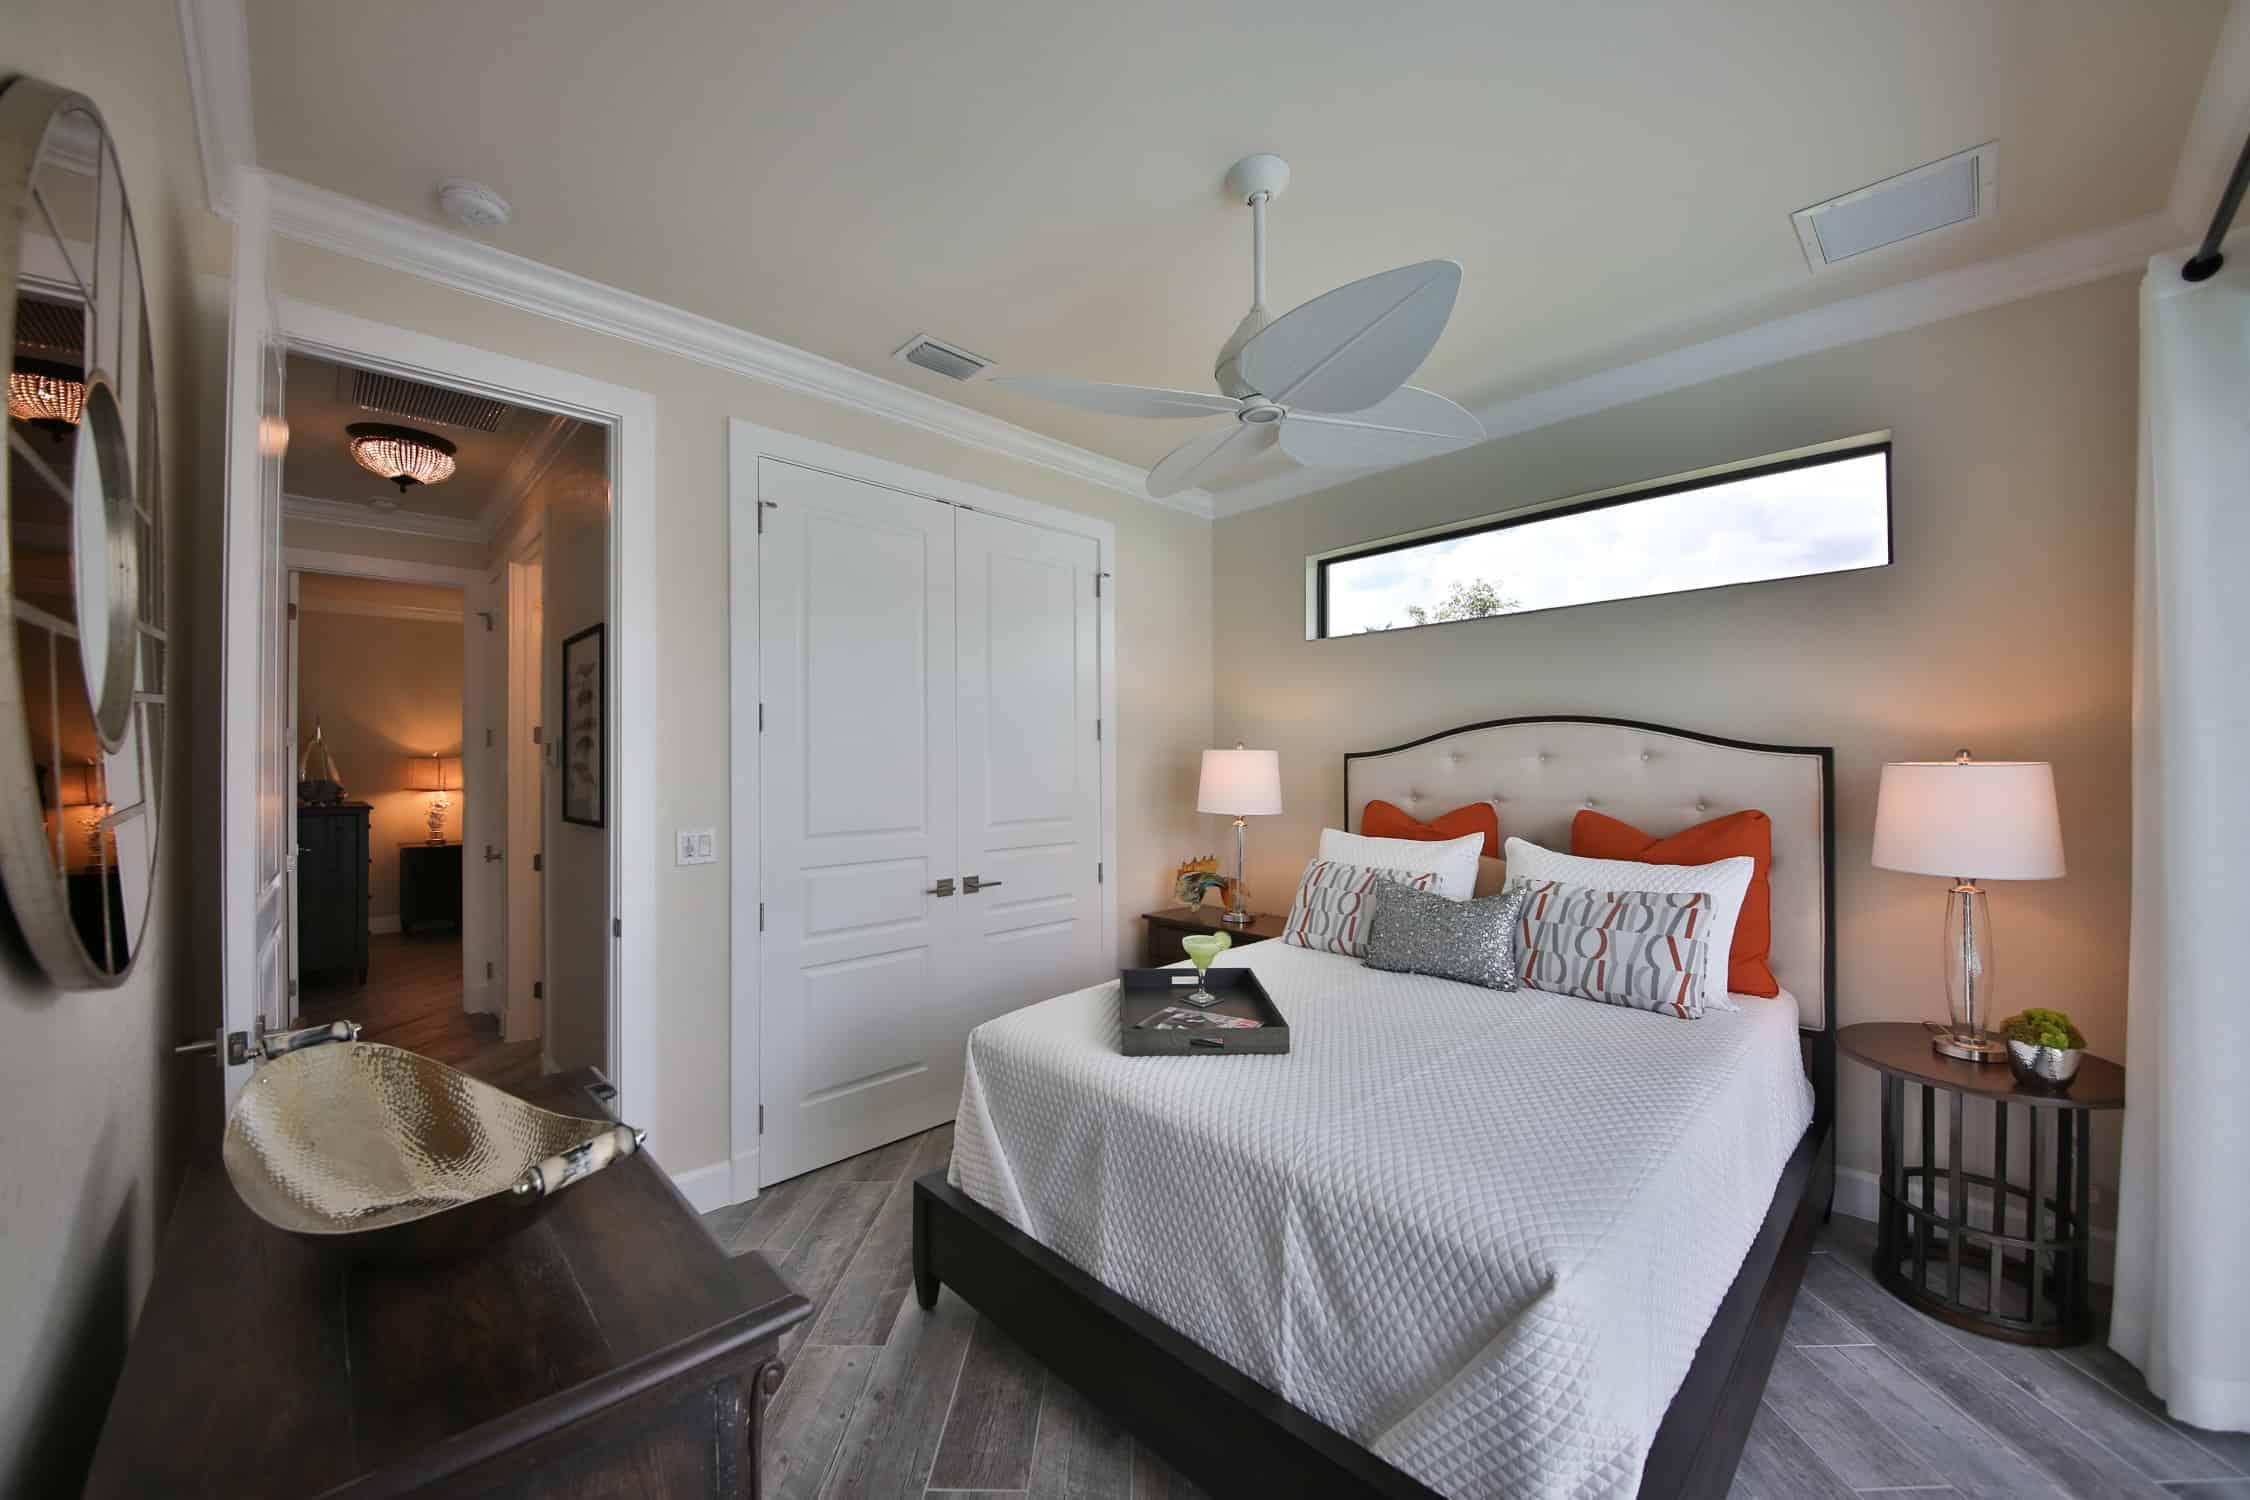 Chiquita – 3 Bedroom 3 Bath 3 Car Garage